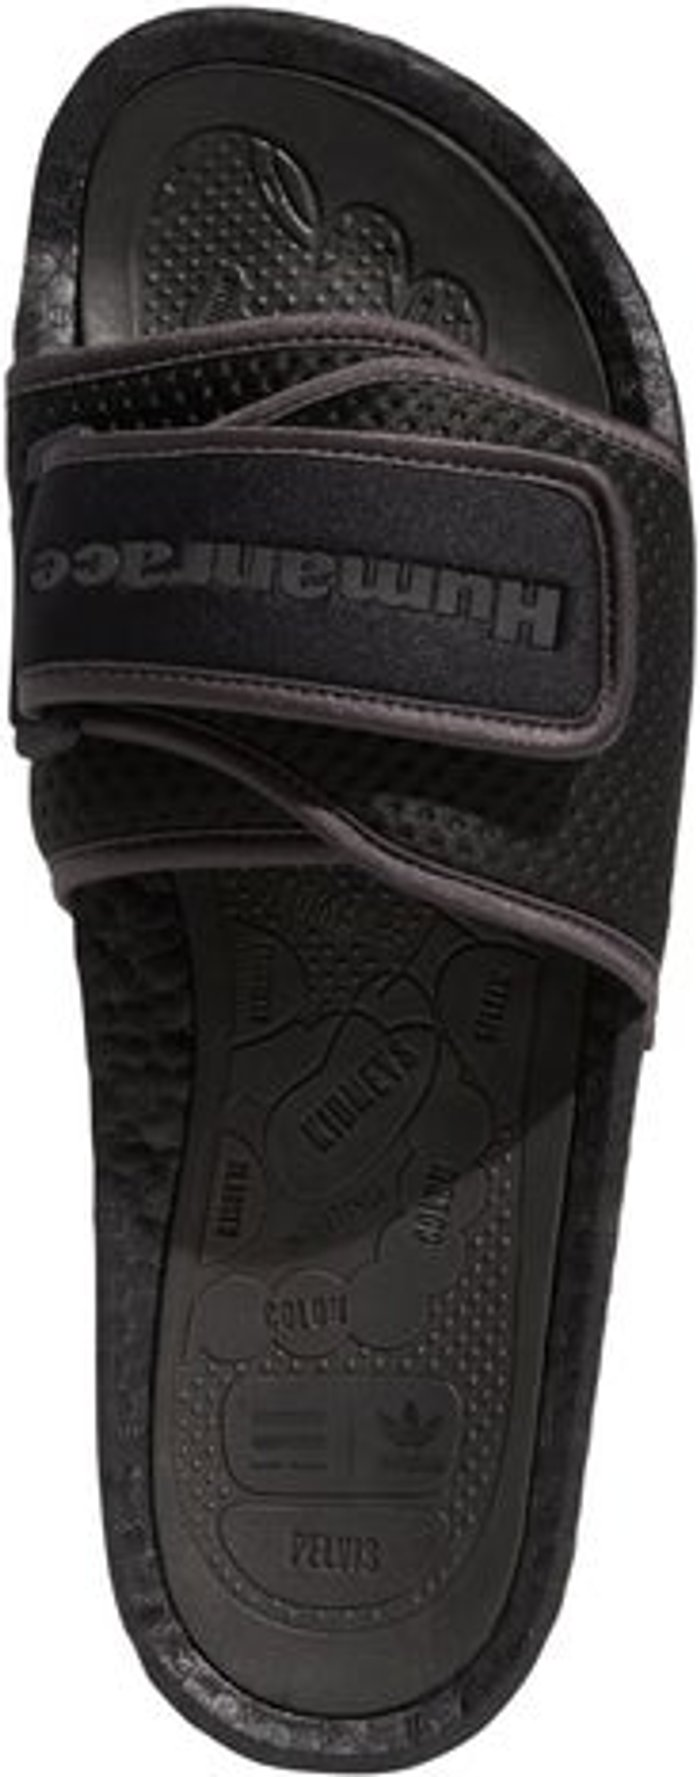 Adidas adidas Chancletas Hu Bf - Women Flip-Flops and Sandals